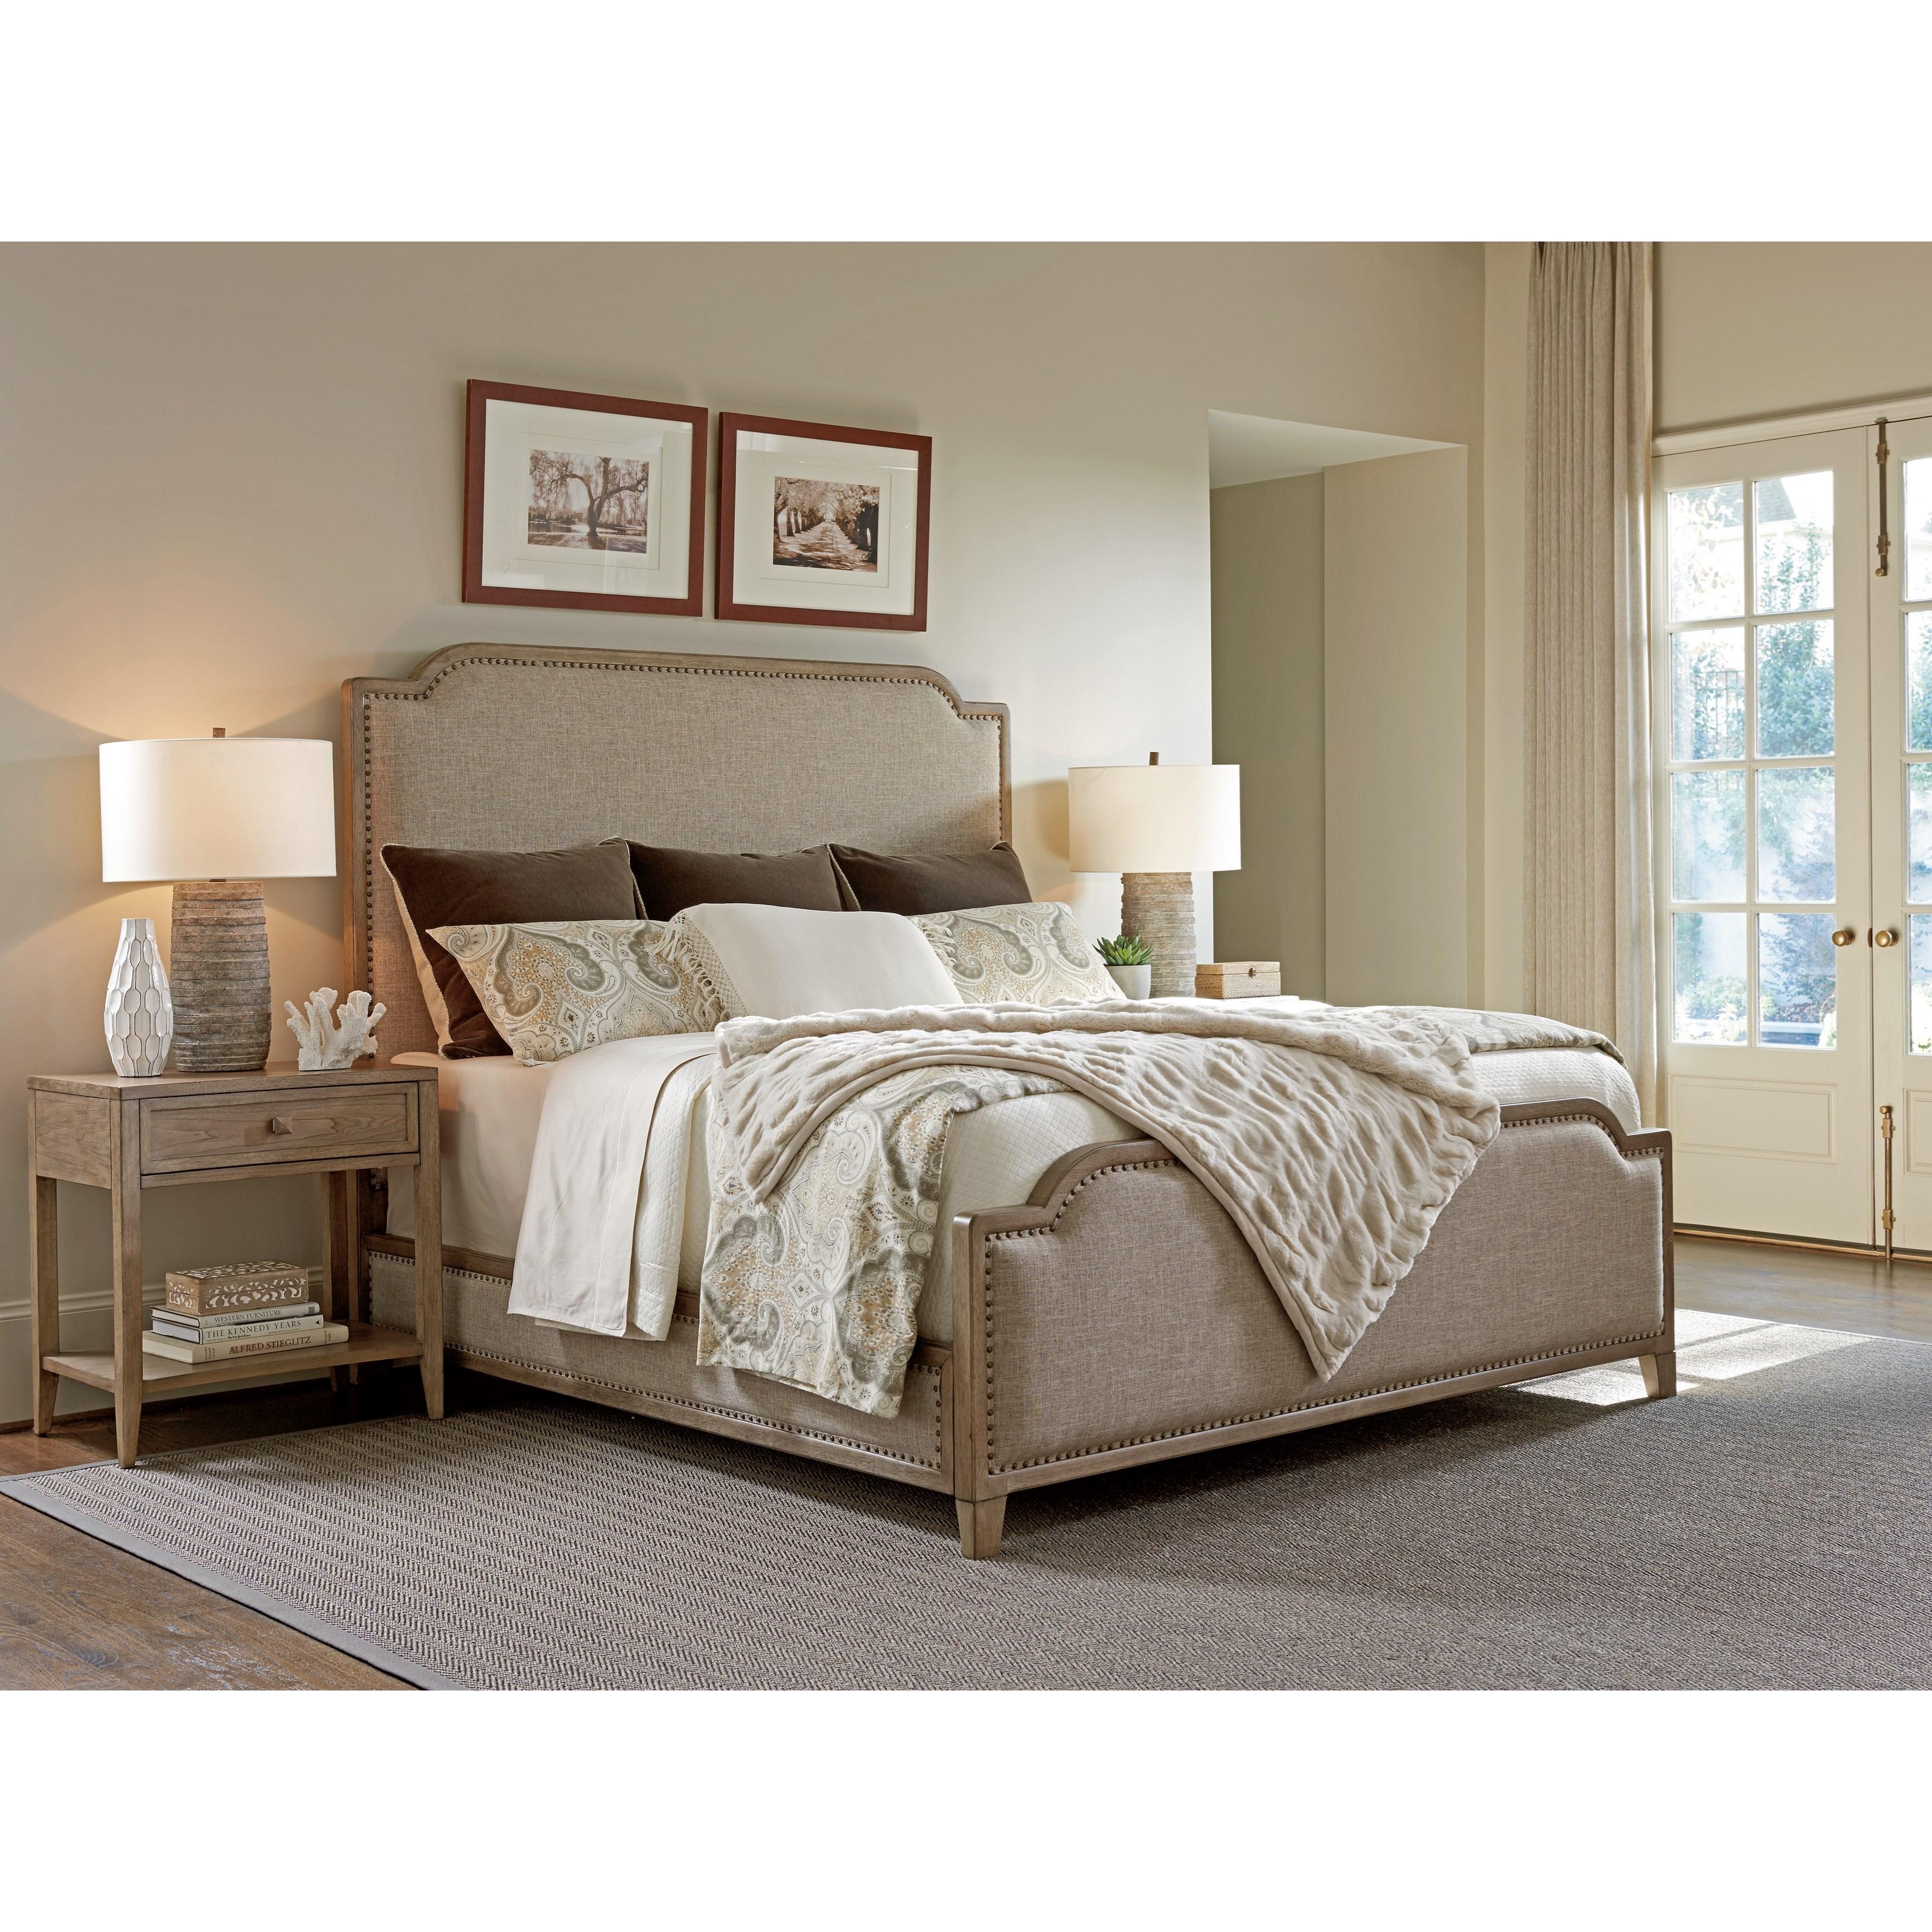 Tommy Bahama Home Cypress Point King Bedroom Group - Item Number: 561 K Bedroom Group 1